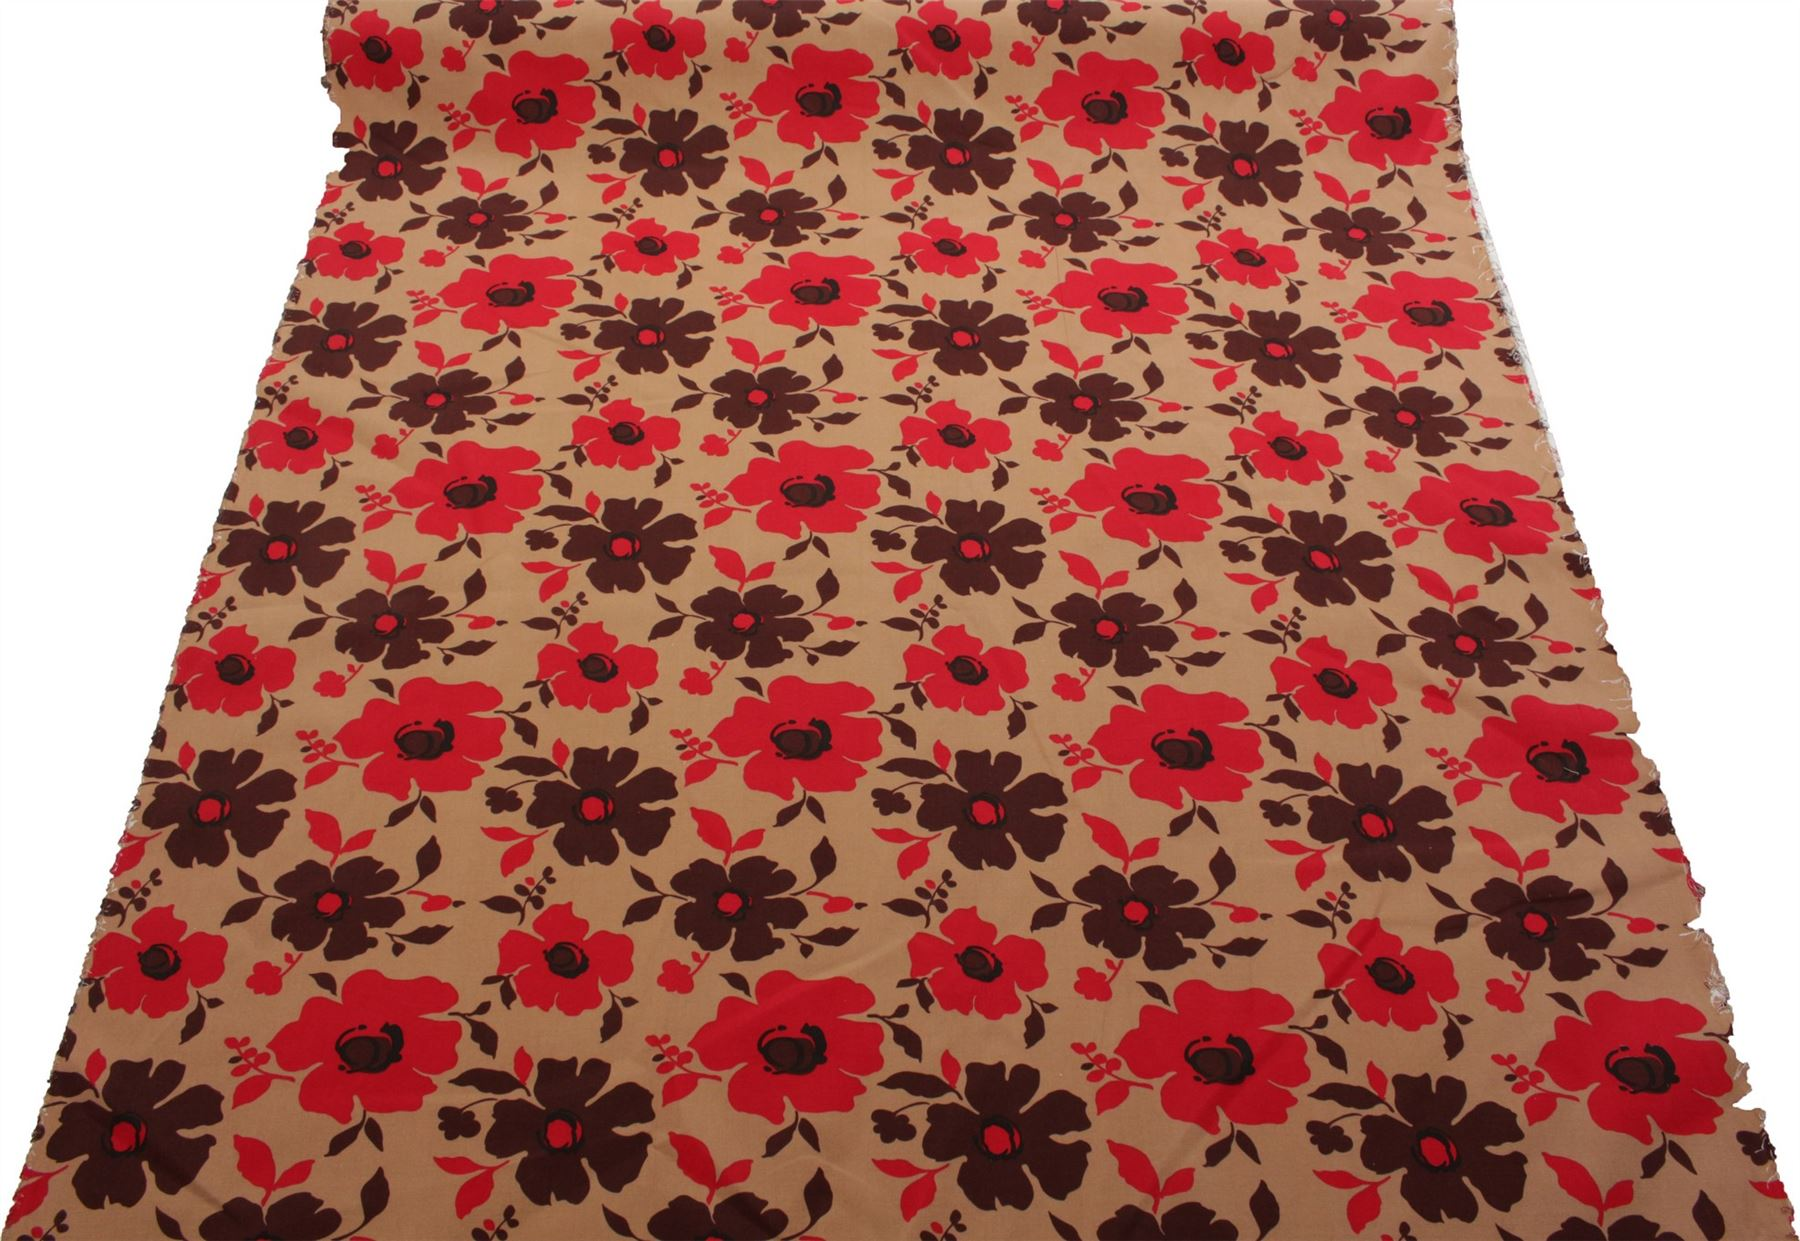 thumbnail 54 - 100% Heavy Cotton Panama Printed Childrens Curtain Cushion Upholstery Fabric